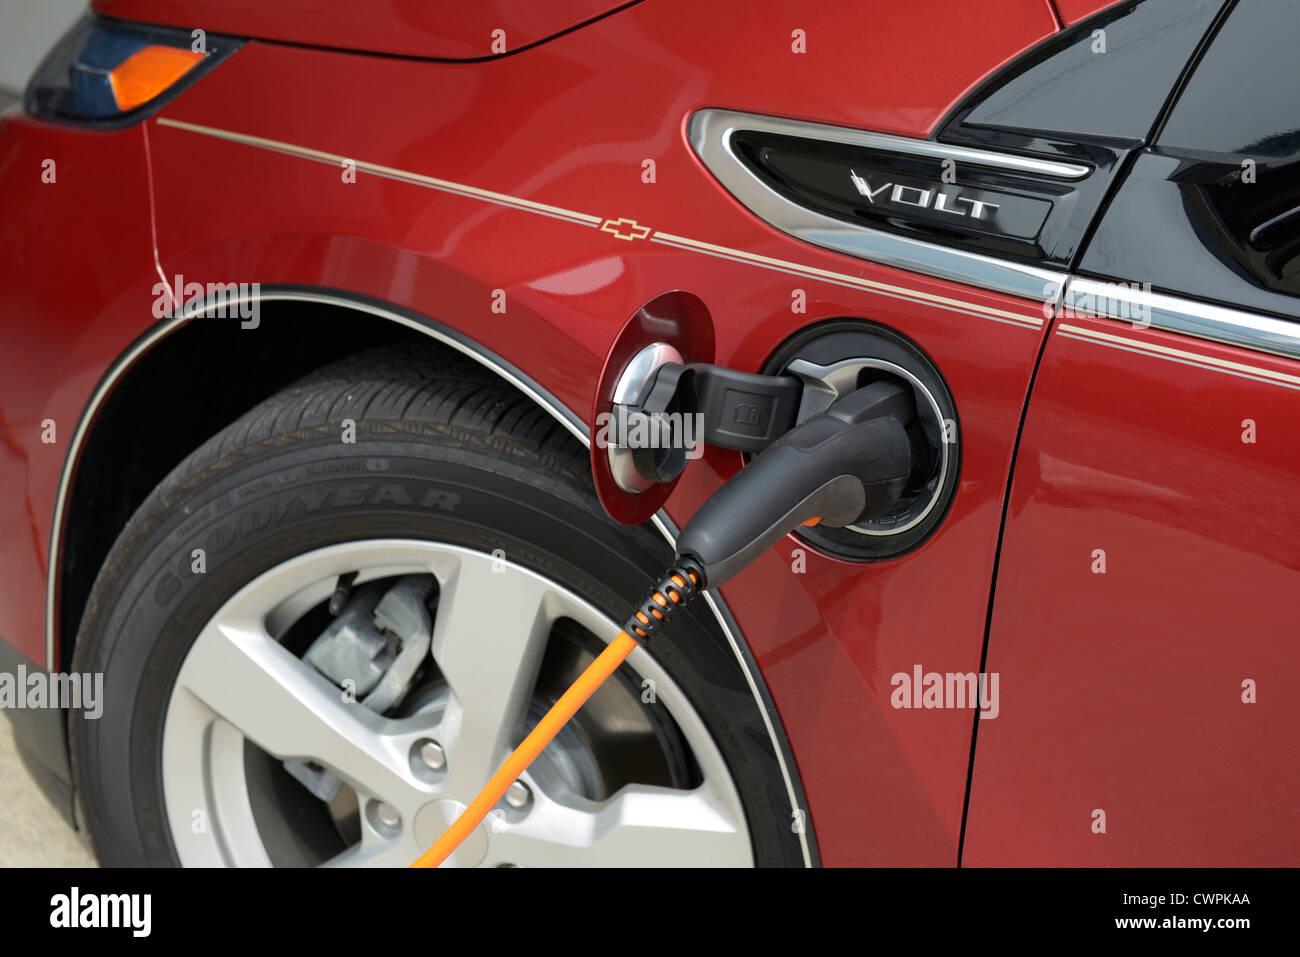 Chevrolet Volt, Elektro-Auto aufladen Stockbild